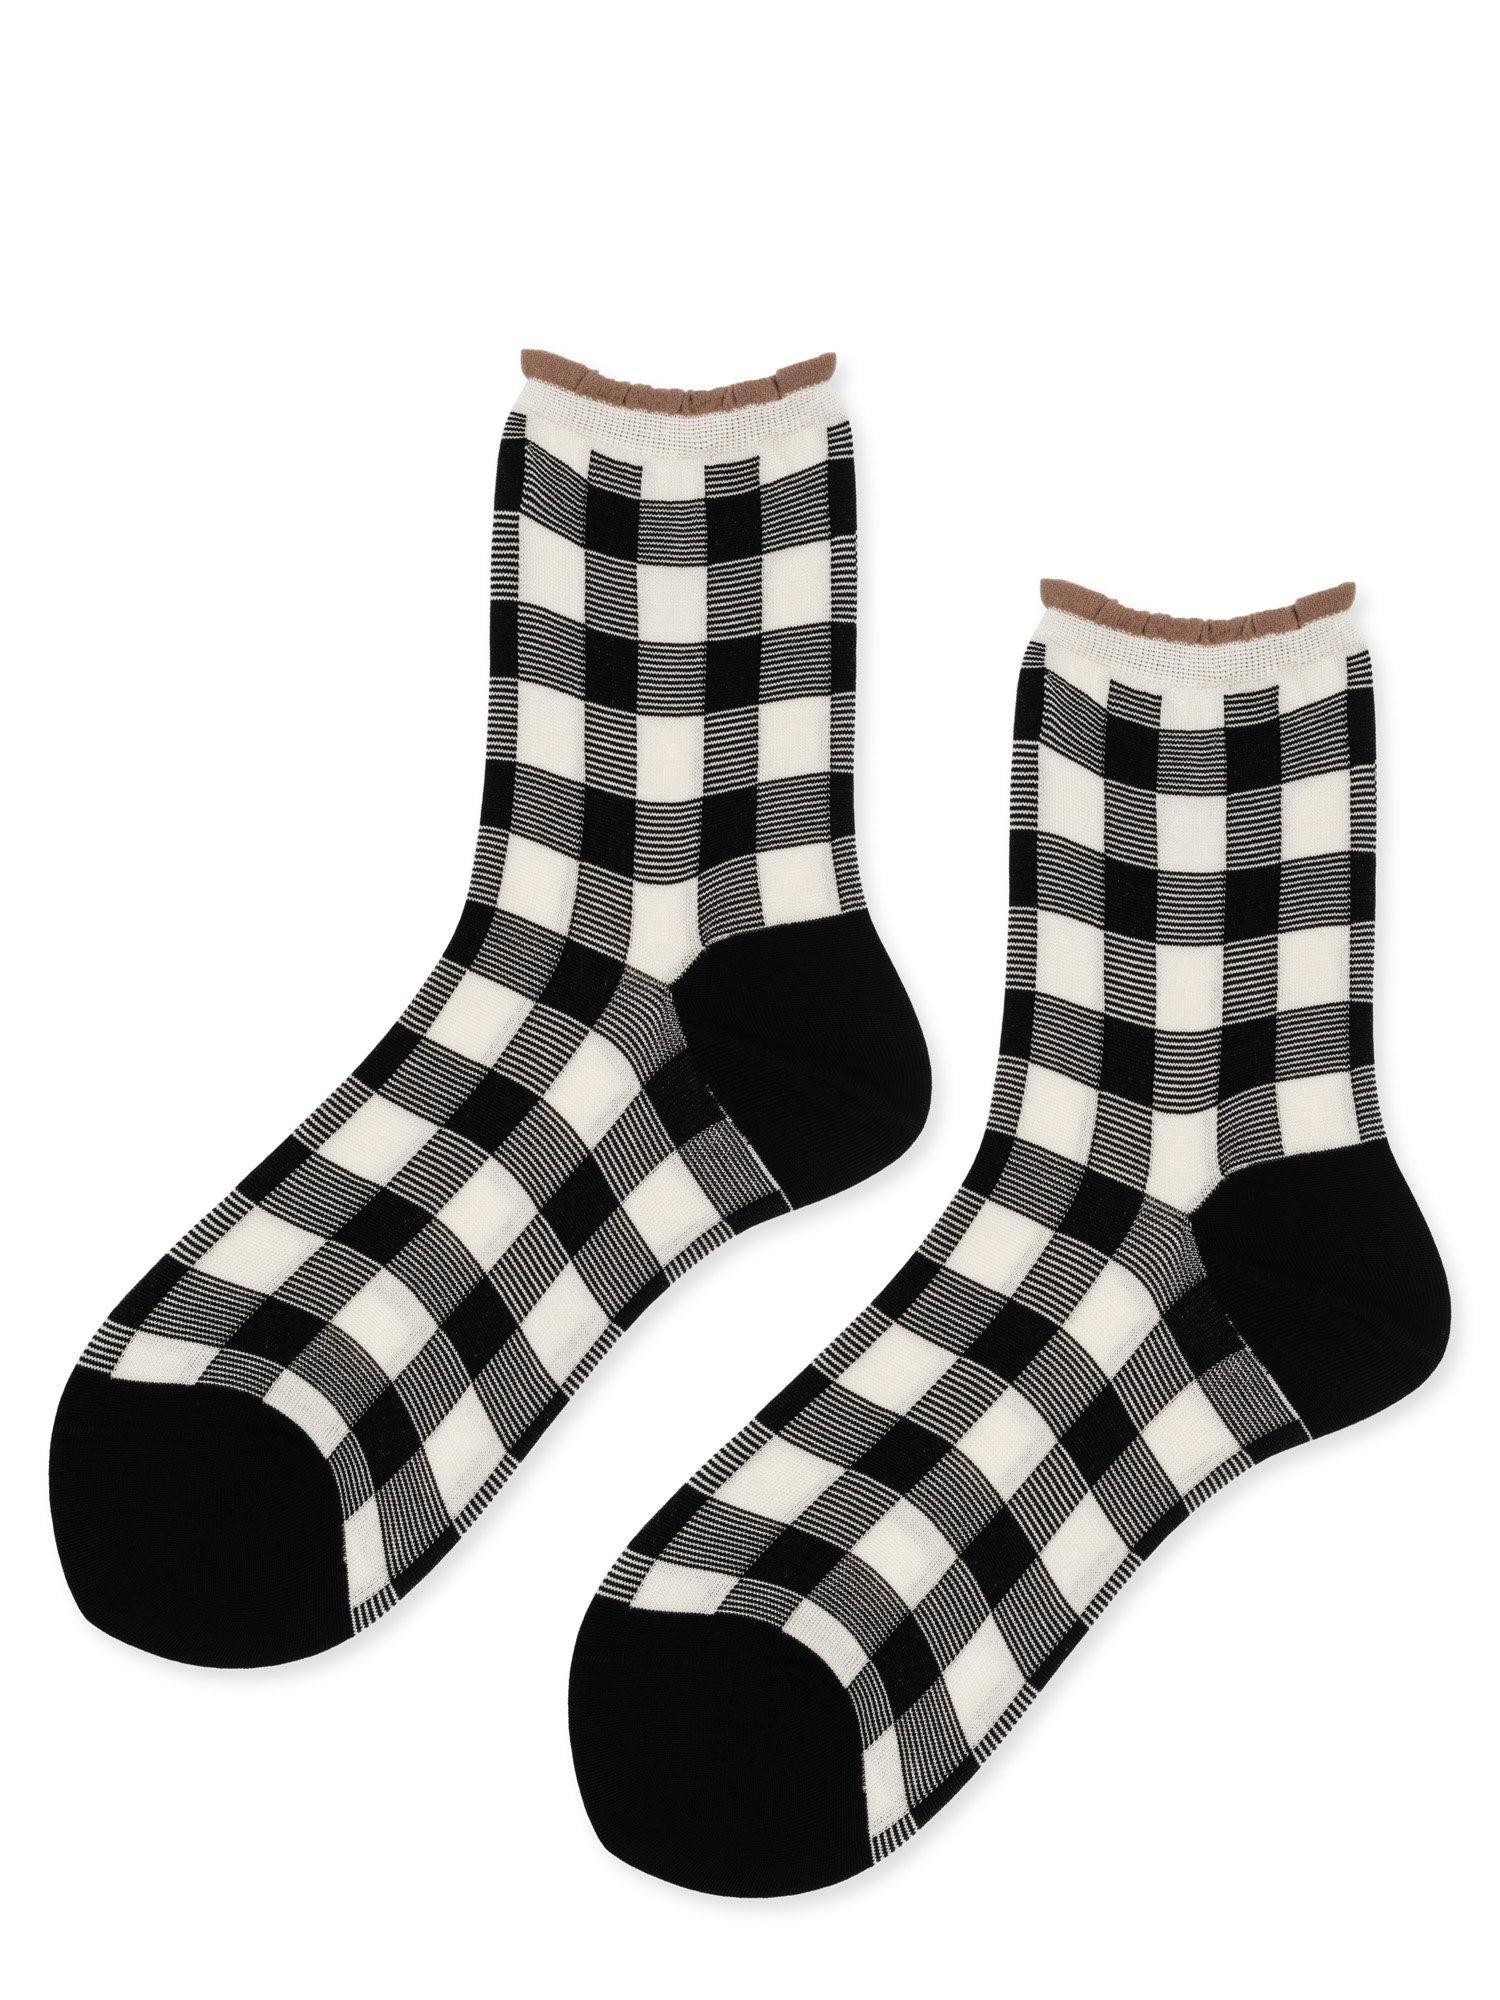 hansel from basel Socks Cotton check black